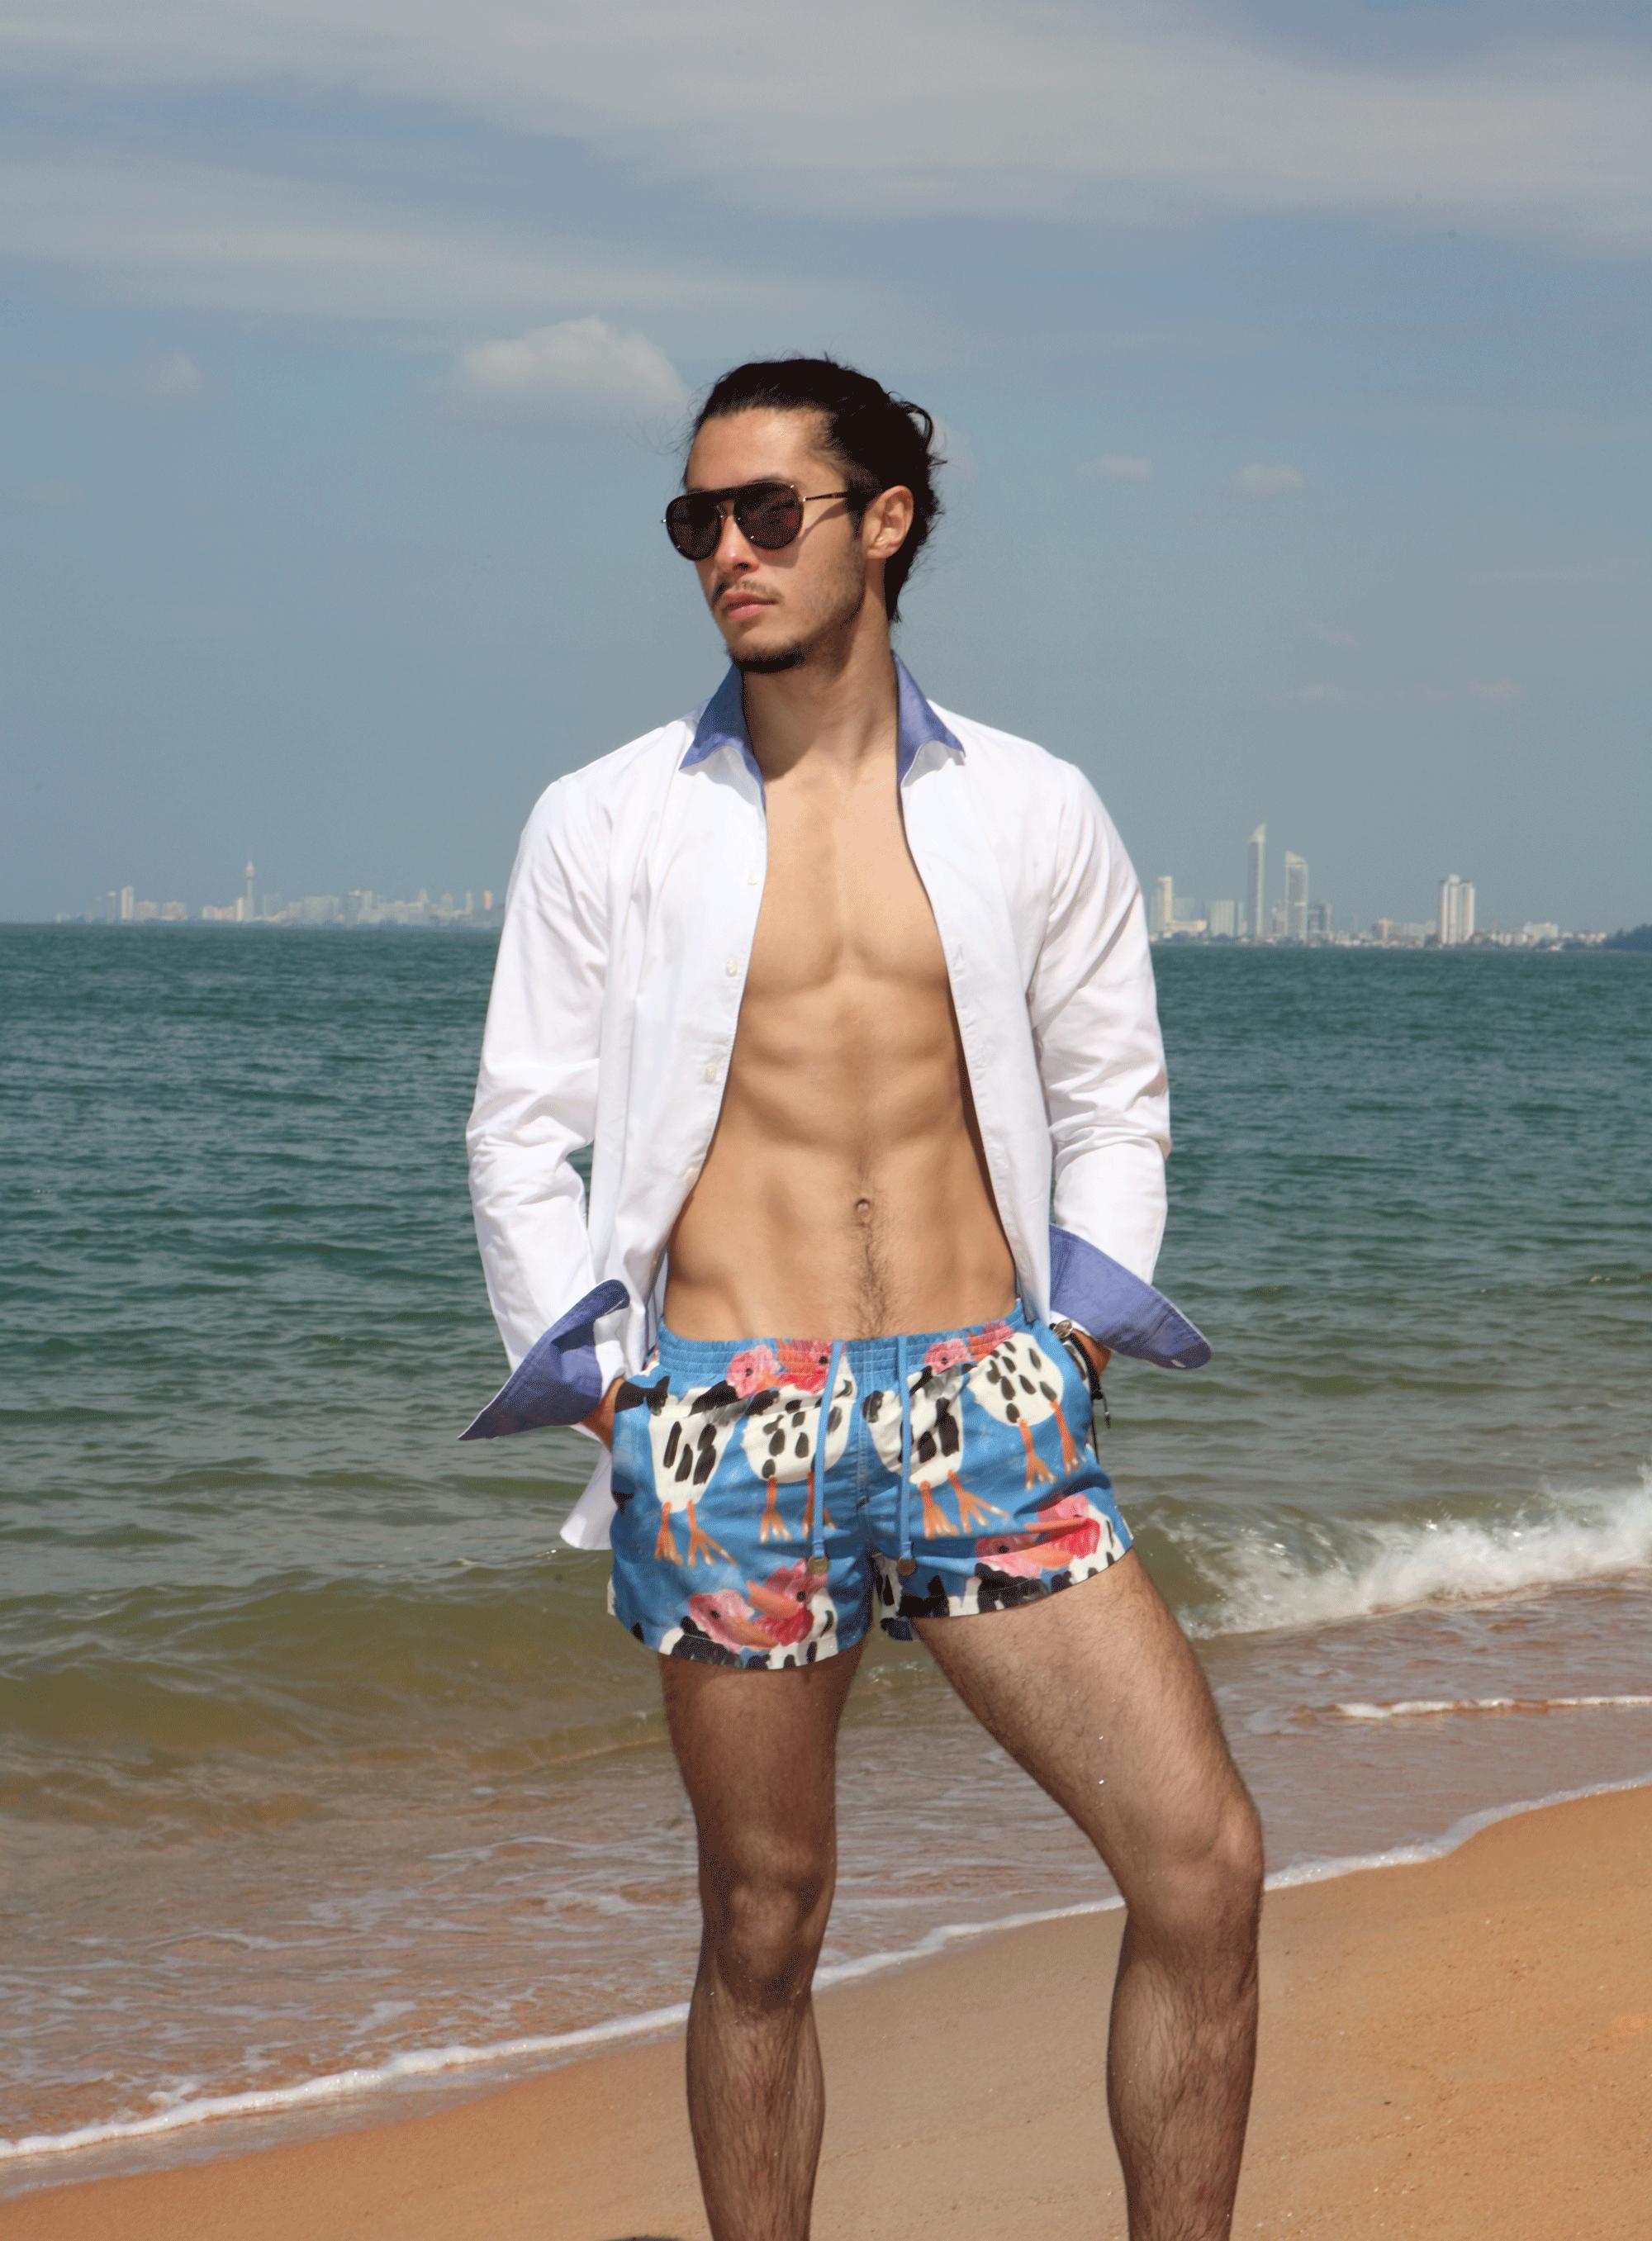 shirt and trunks : TIMO / sunglasses : Blake Kuwahara